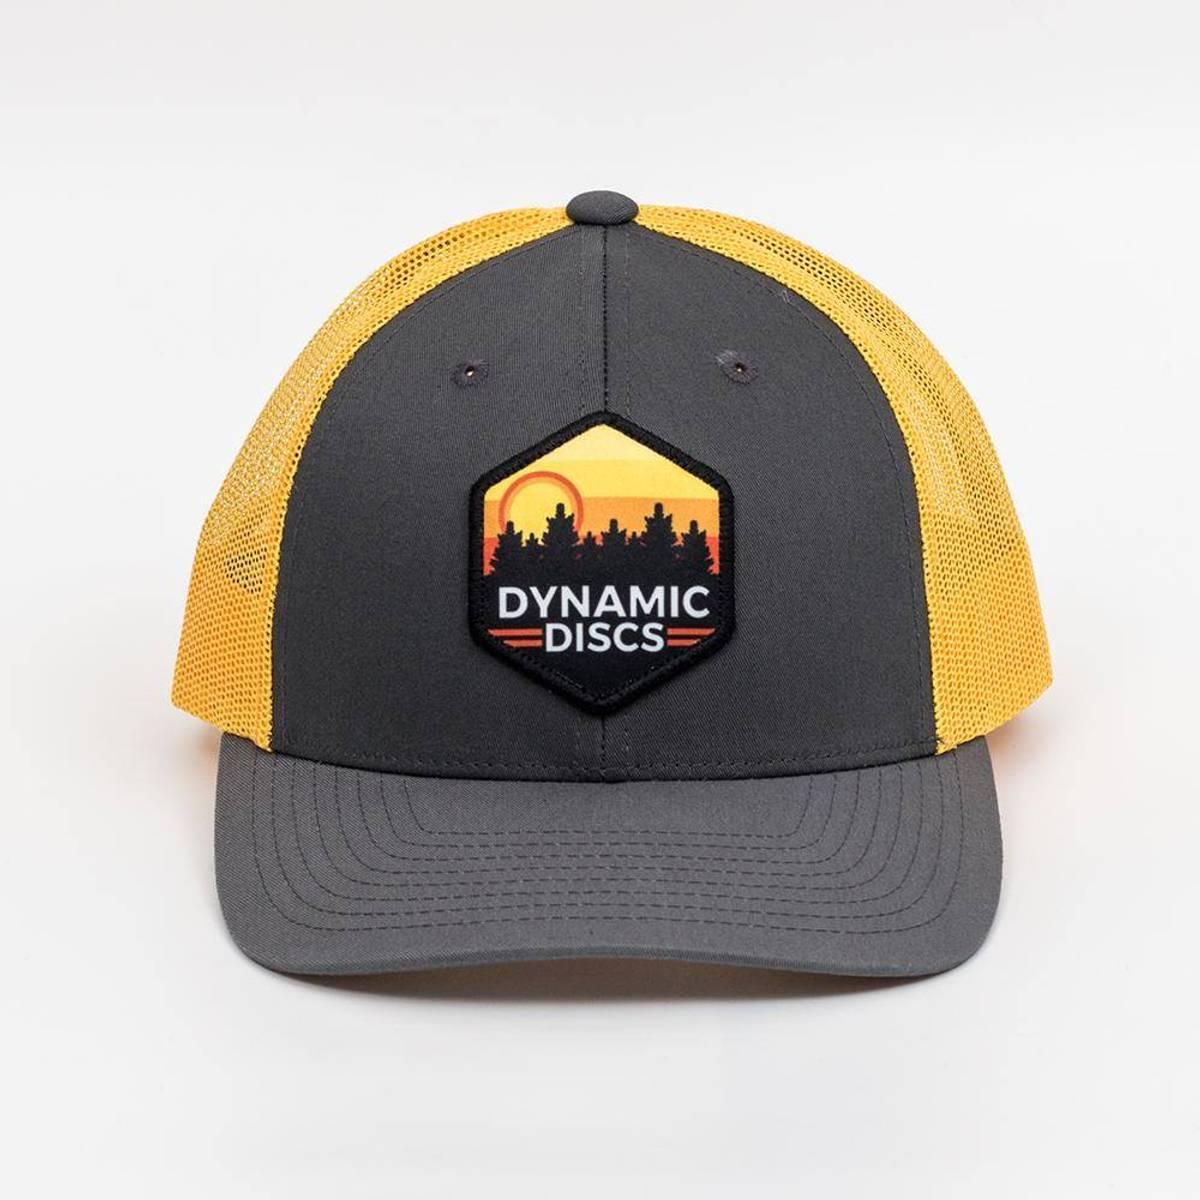 Dynamic Discs Sunset Hex Trucker